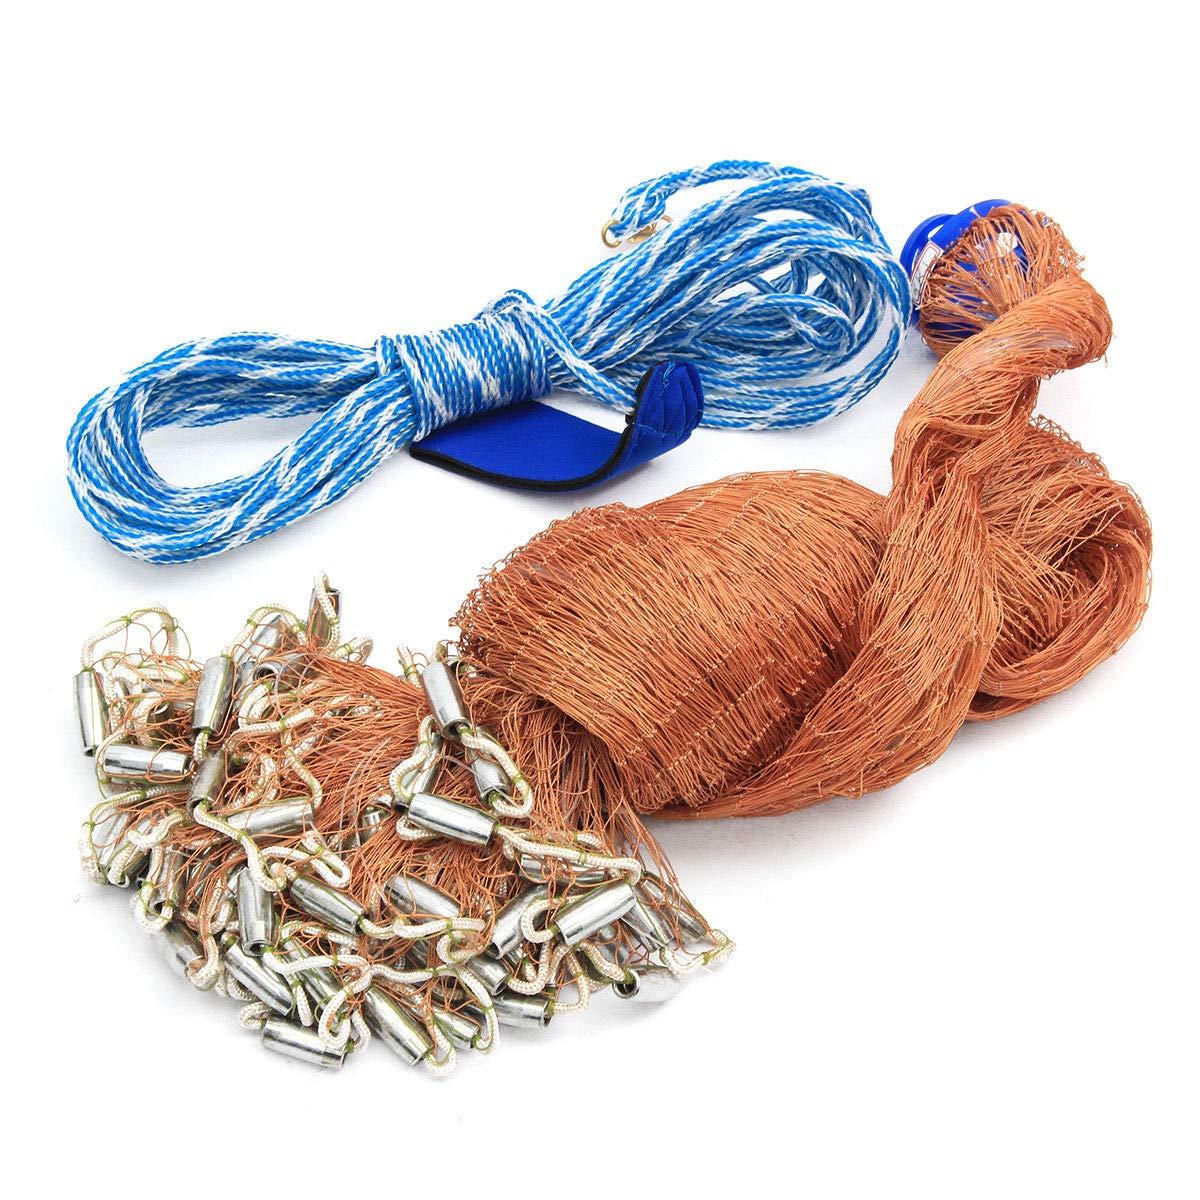 Durable Fishing Net Easy Throw Bait Hand Casting Strong Nylon Line W// Sinker